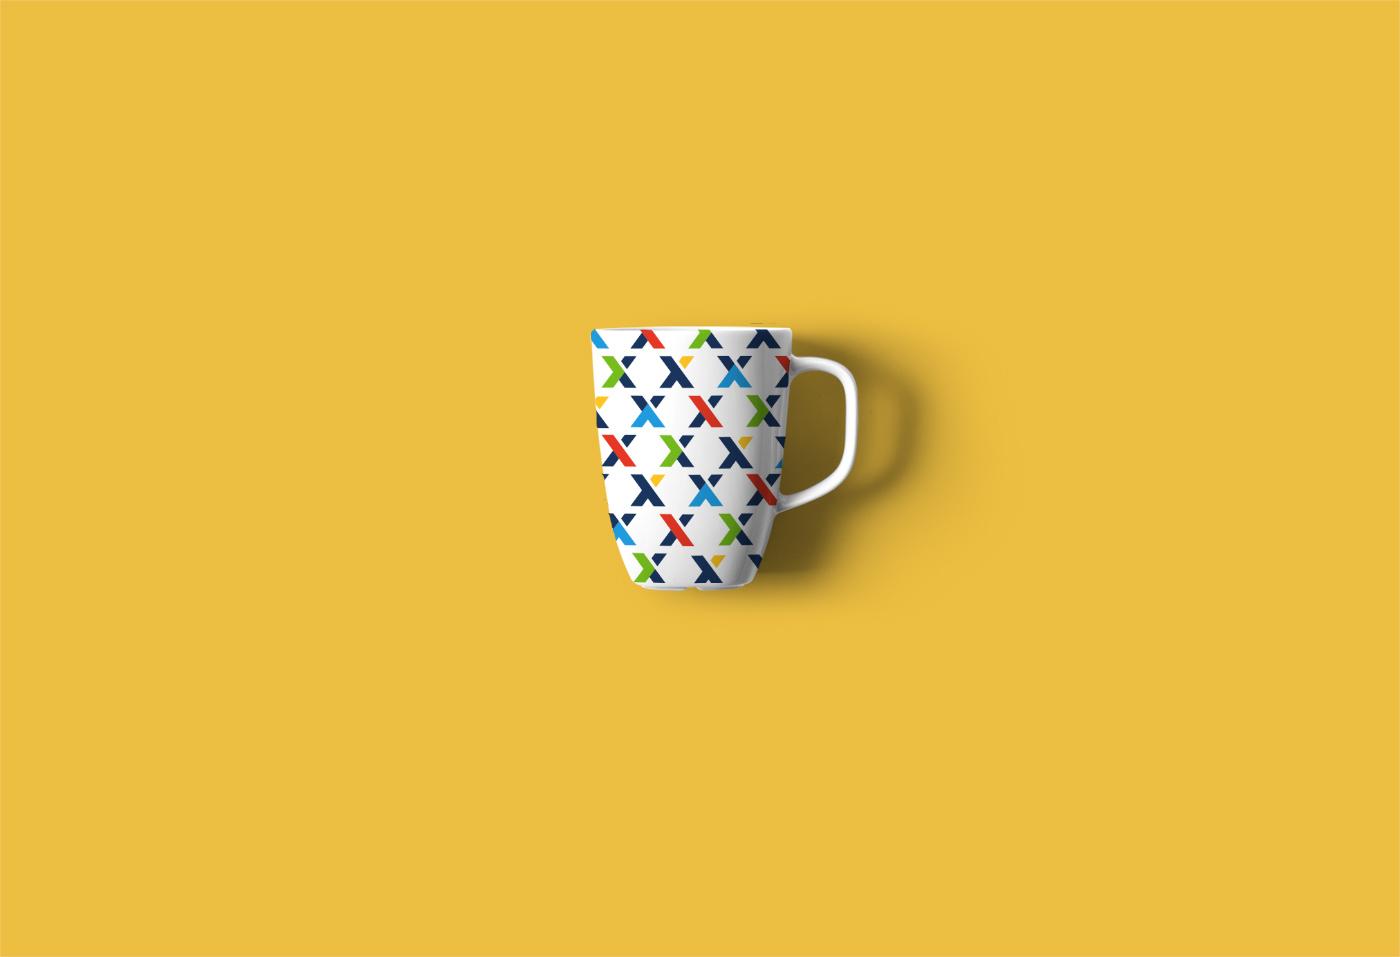 pixelarte-diseno-merchandising-para-xpr